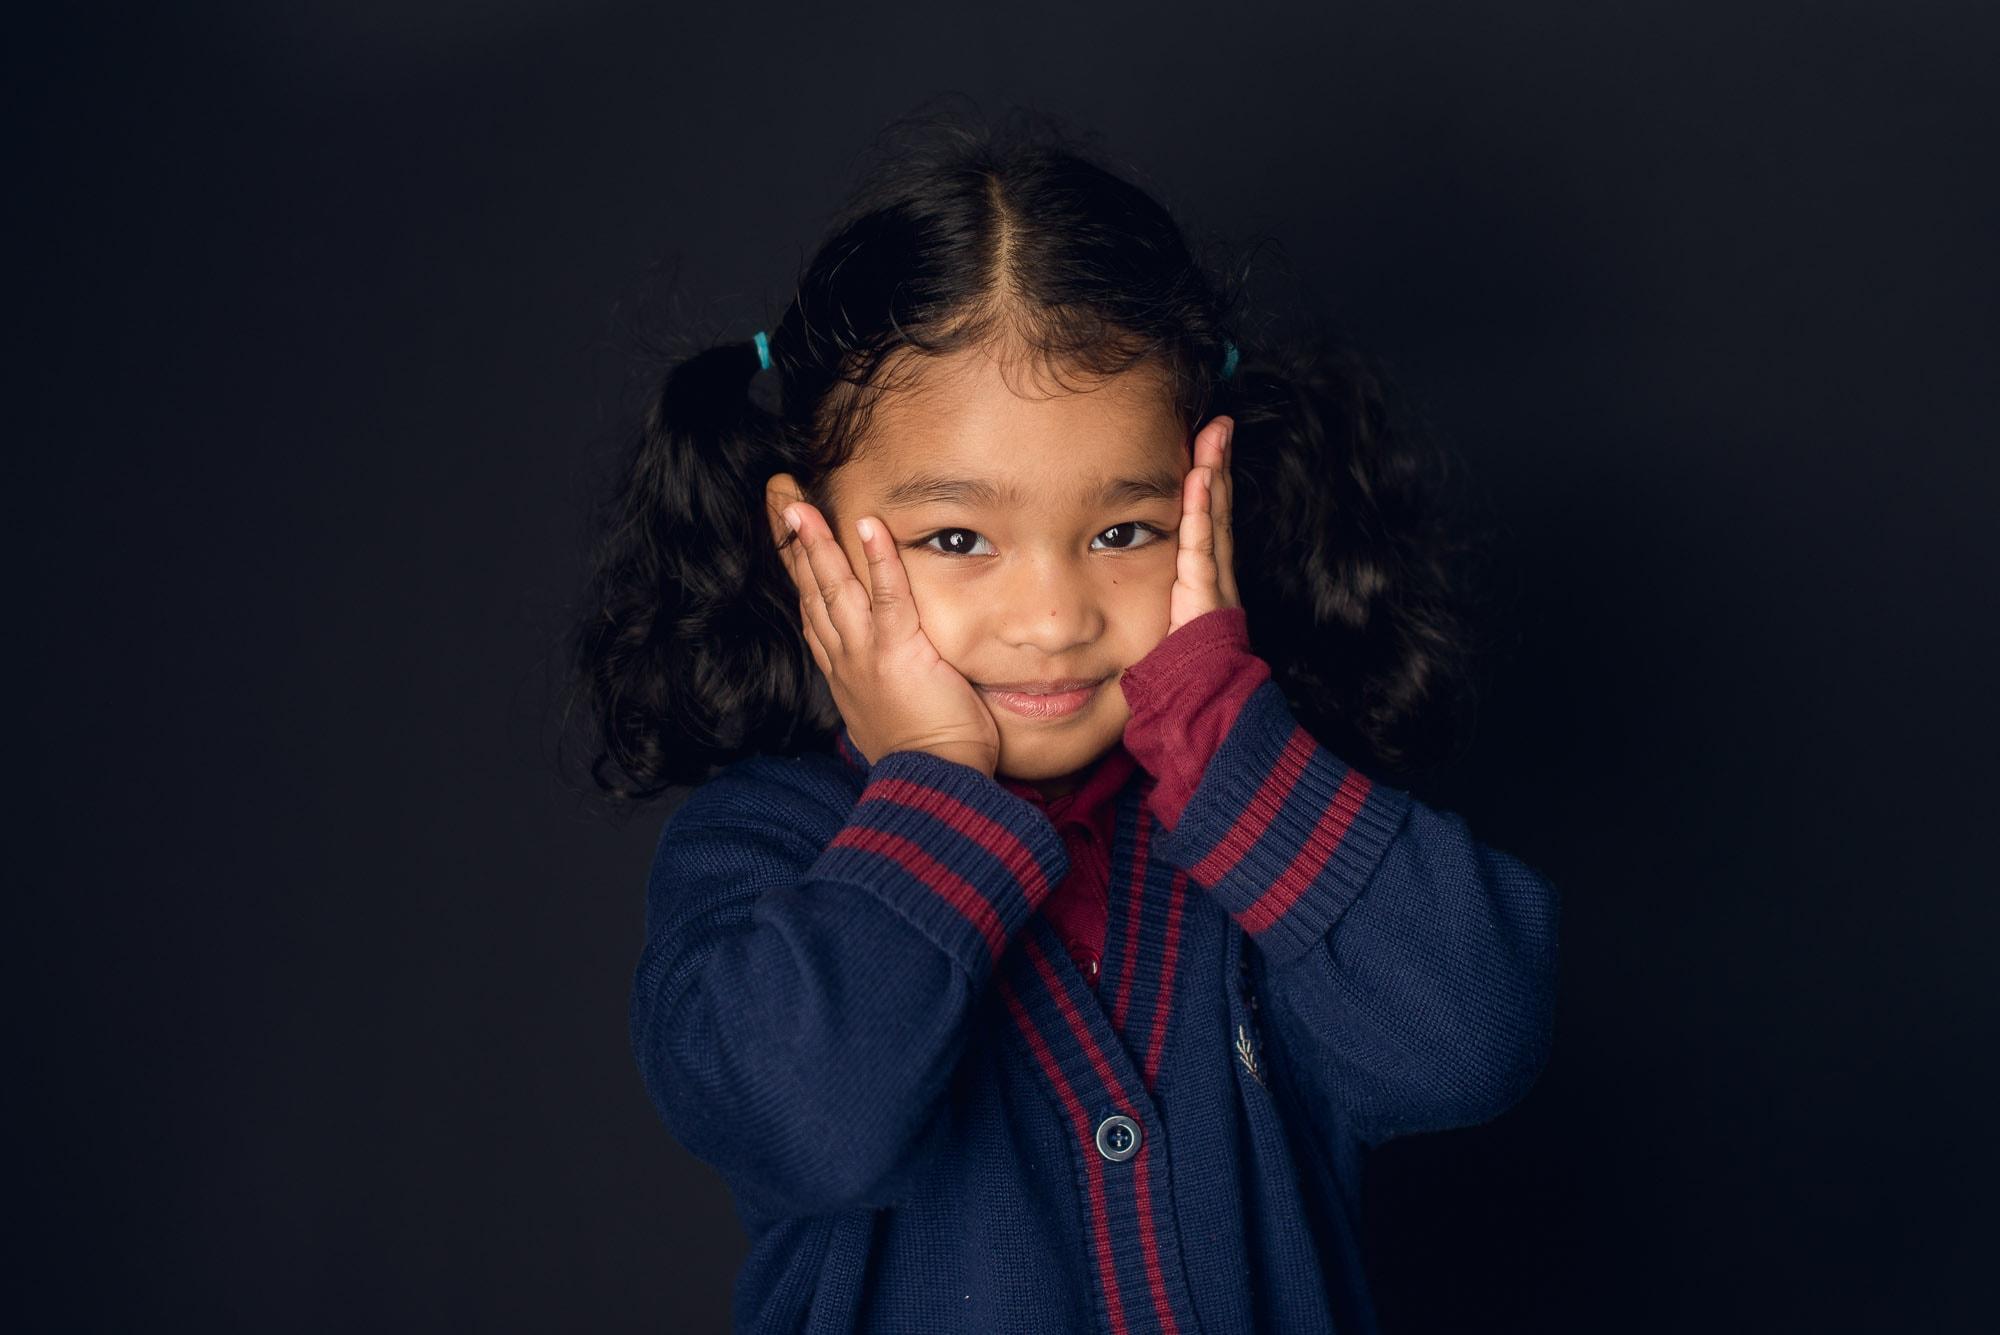 Cute girl smushing cheeks in Burnaby daycare photos